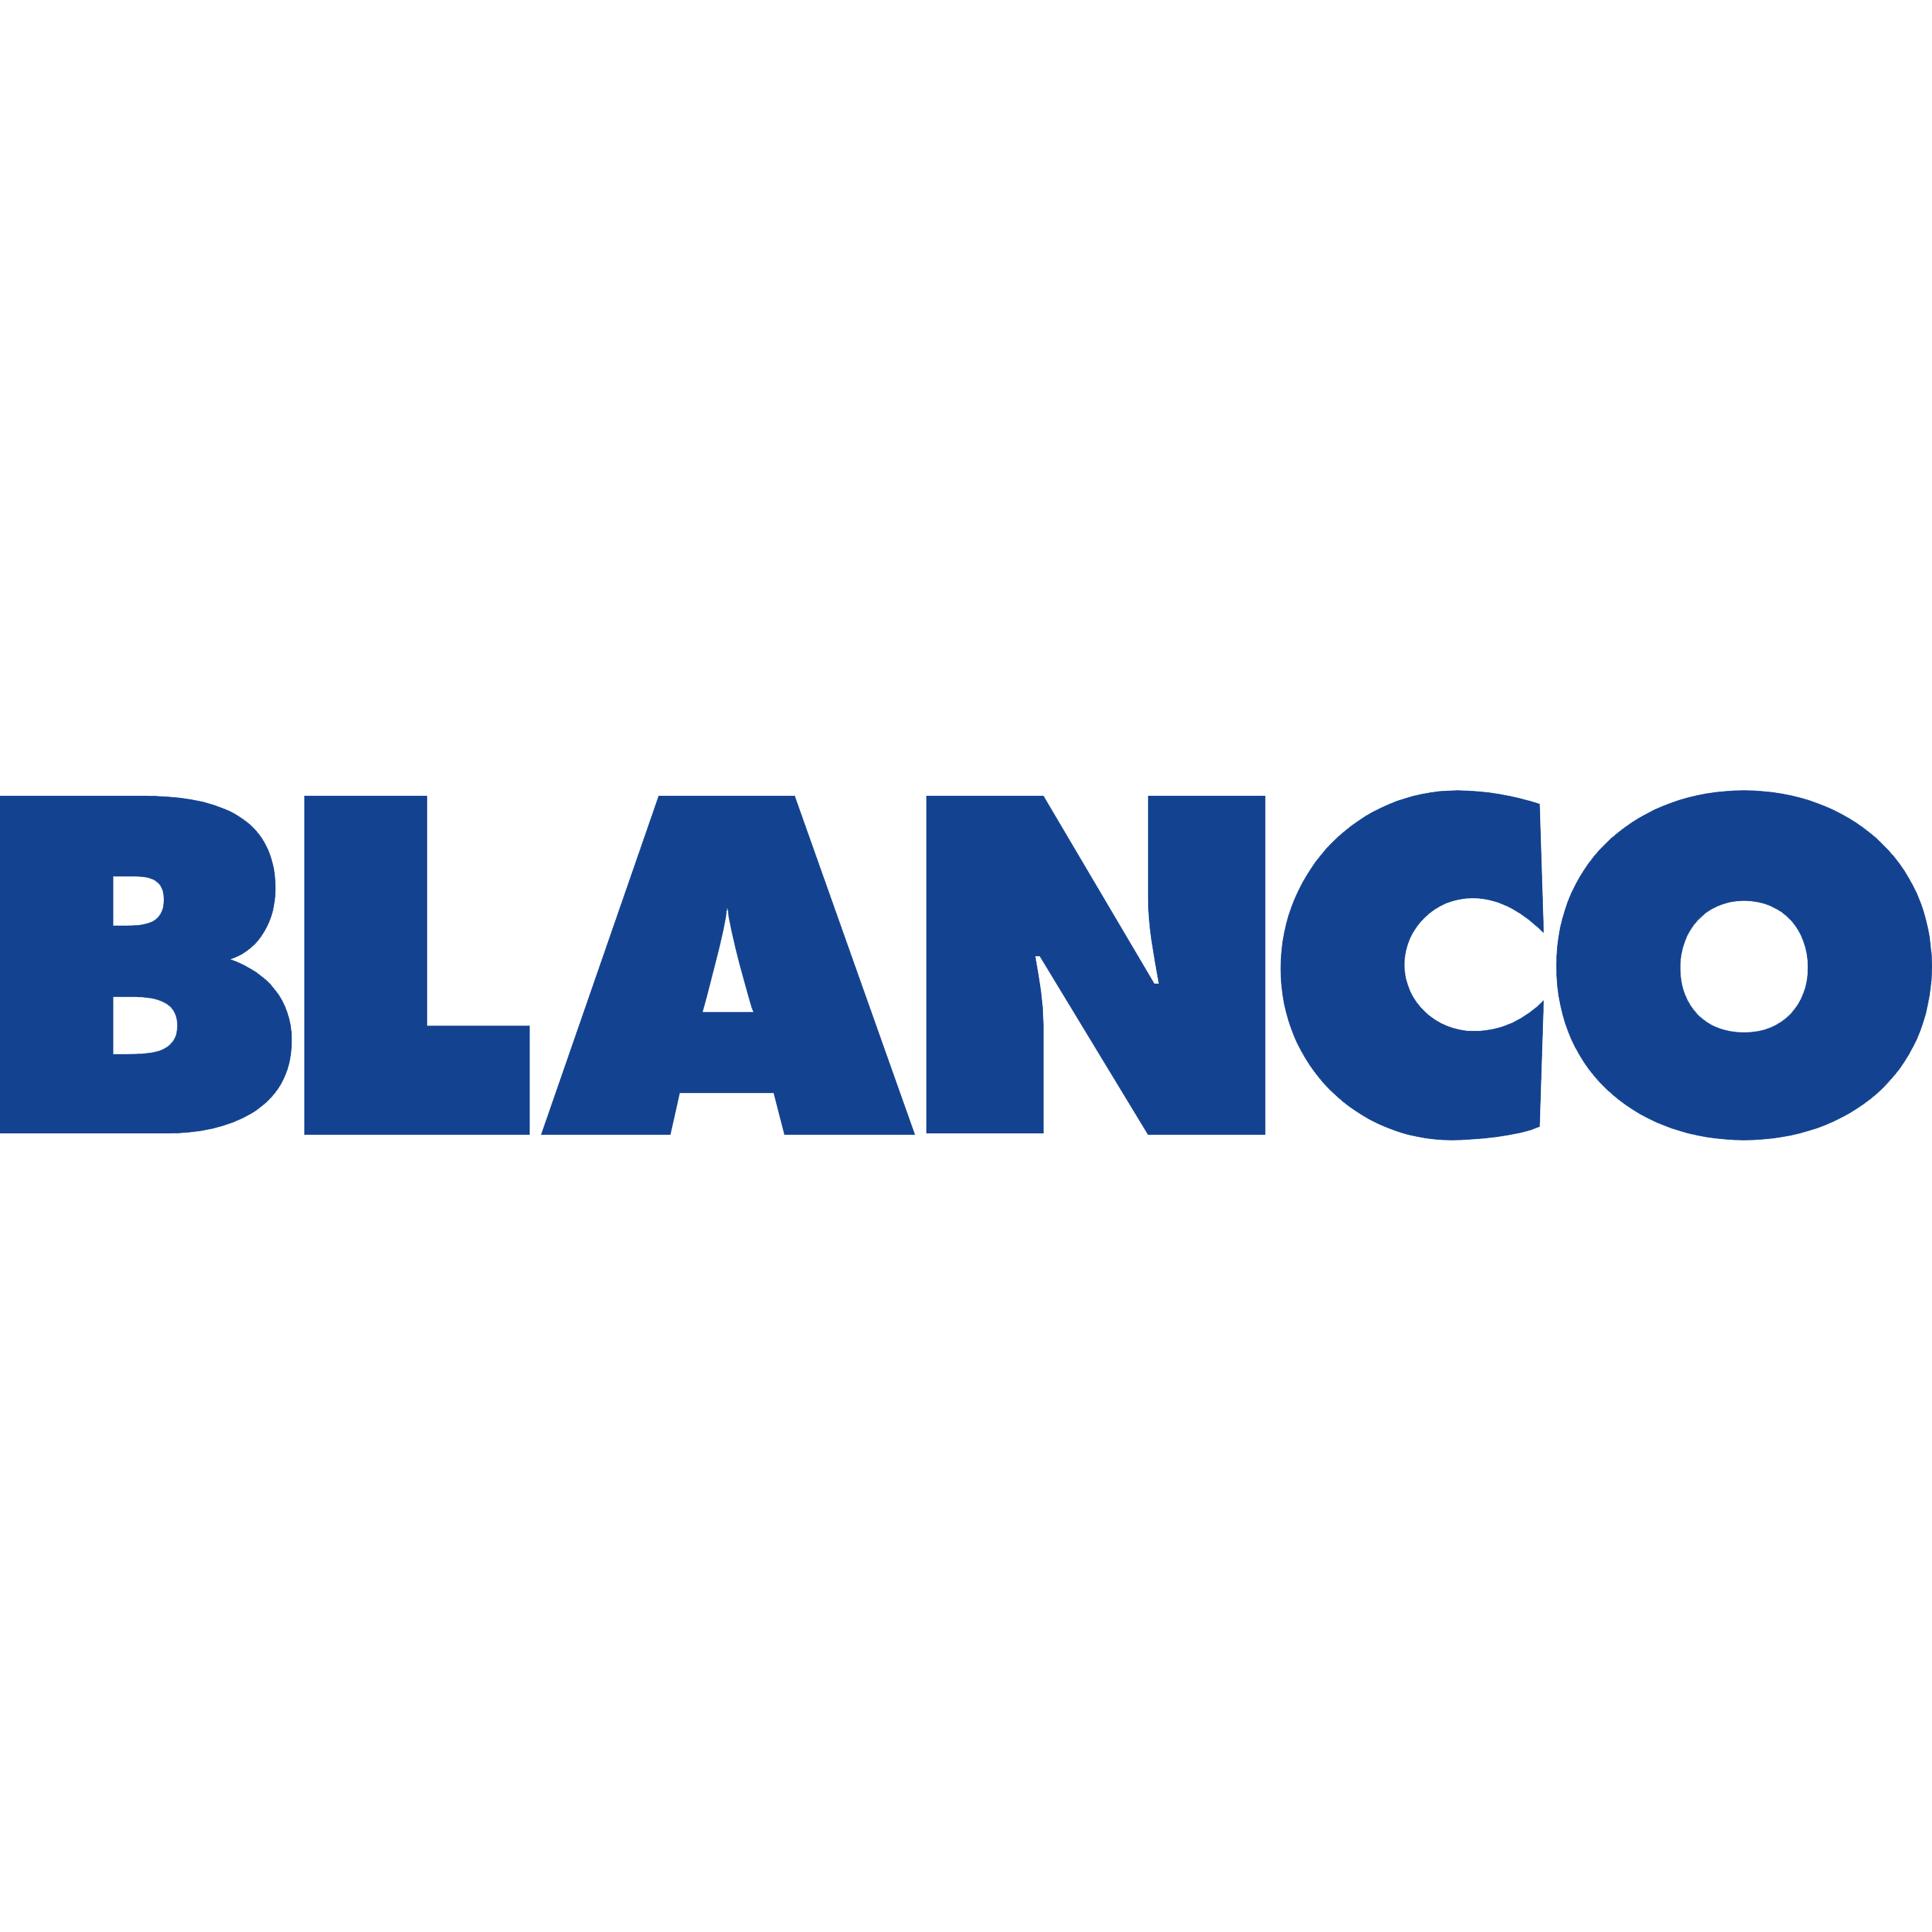 BLANCO LOGO 1